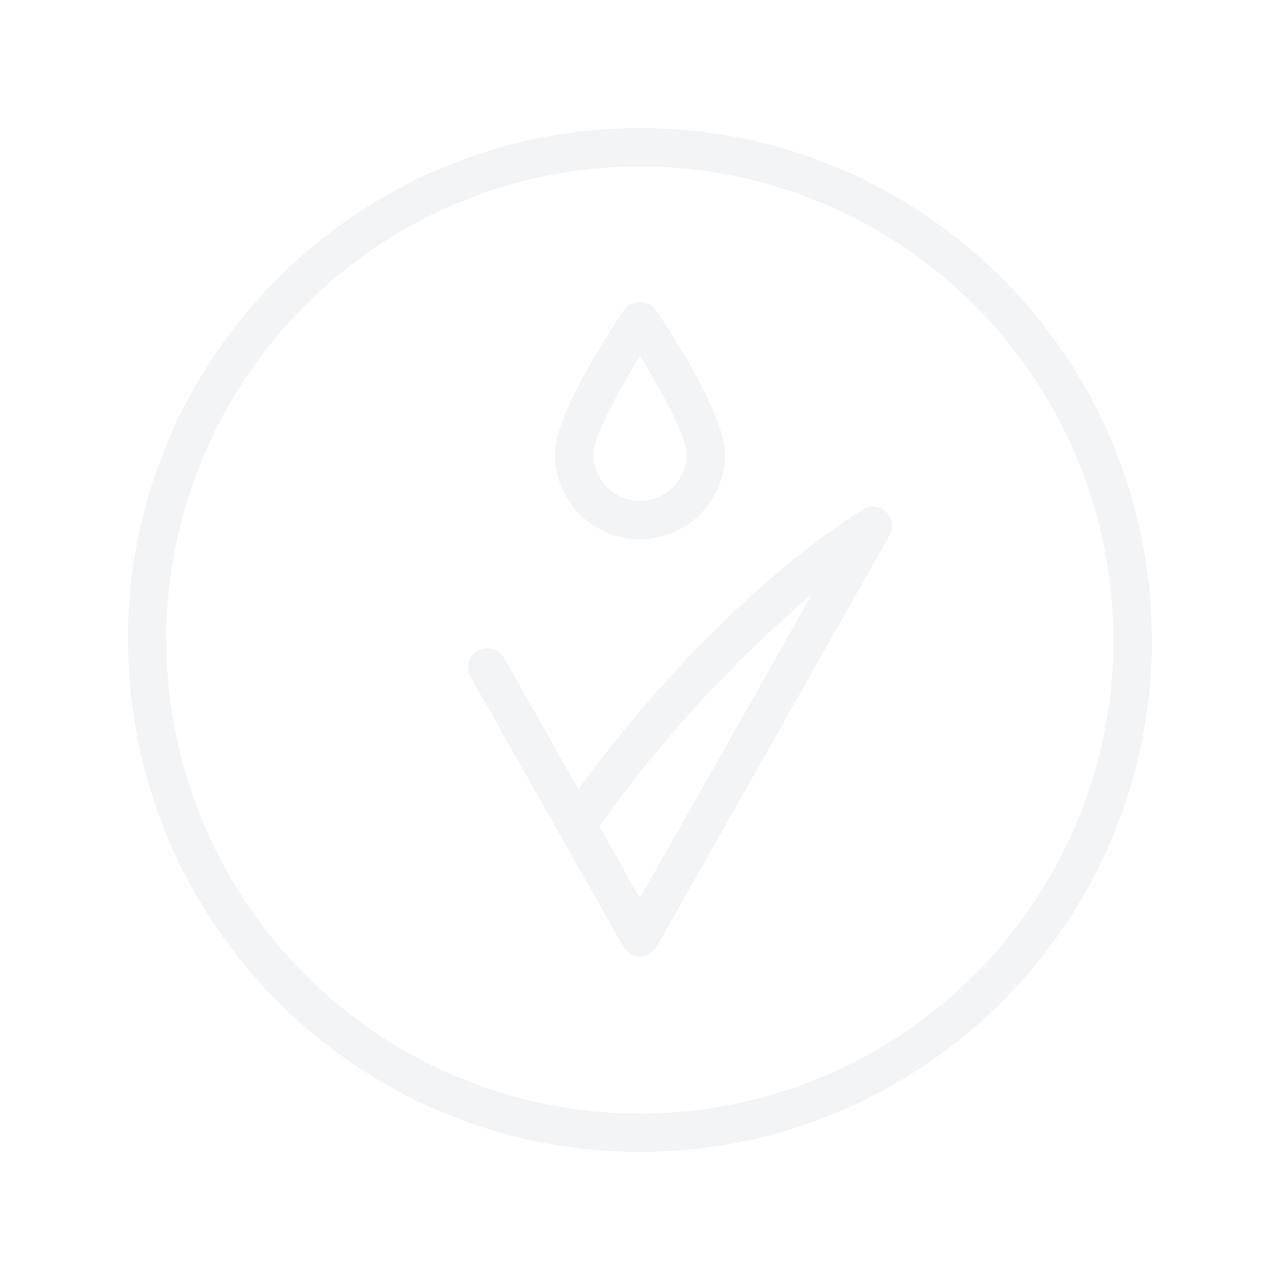 ITS SKIN Babyface One Step Base SPF15 Lavender Pink 35g